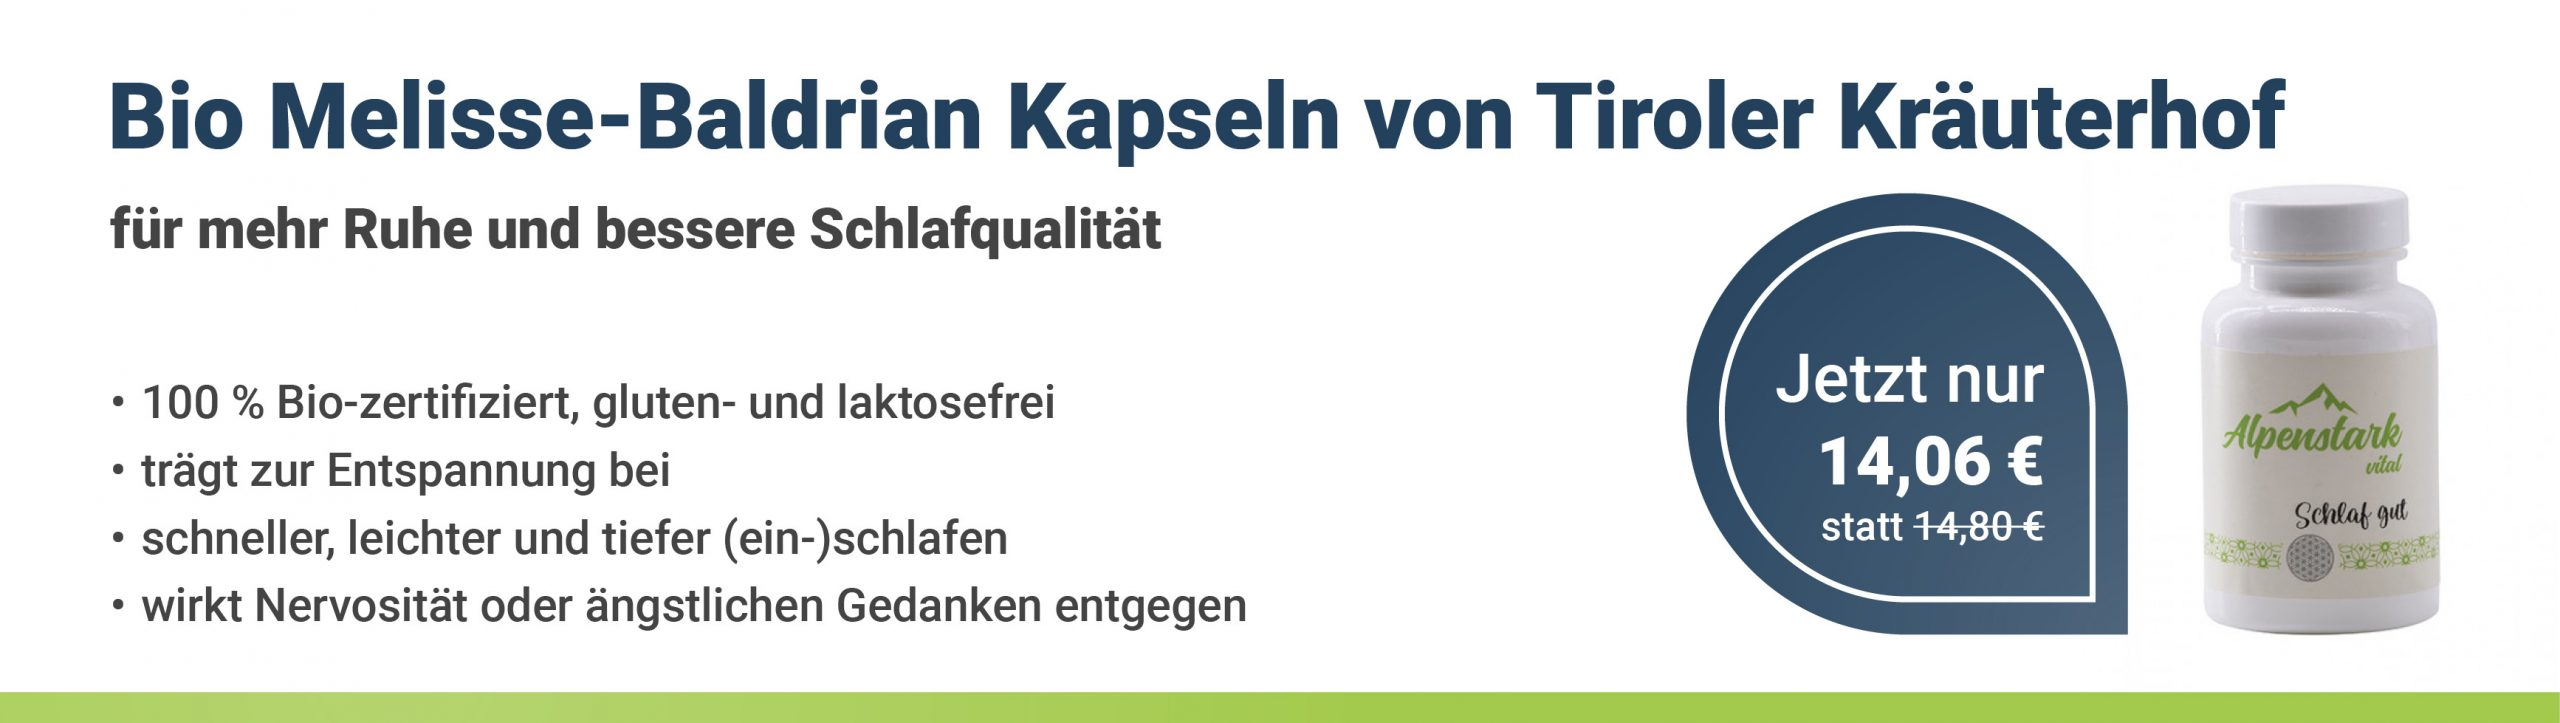 https://www.health-rise.de/wp-content/uploads/2021/09/Melisse-Baldrian-Kapseln-mobil.jpg